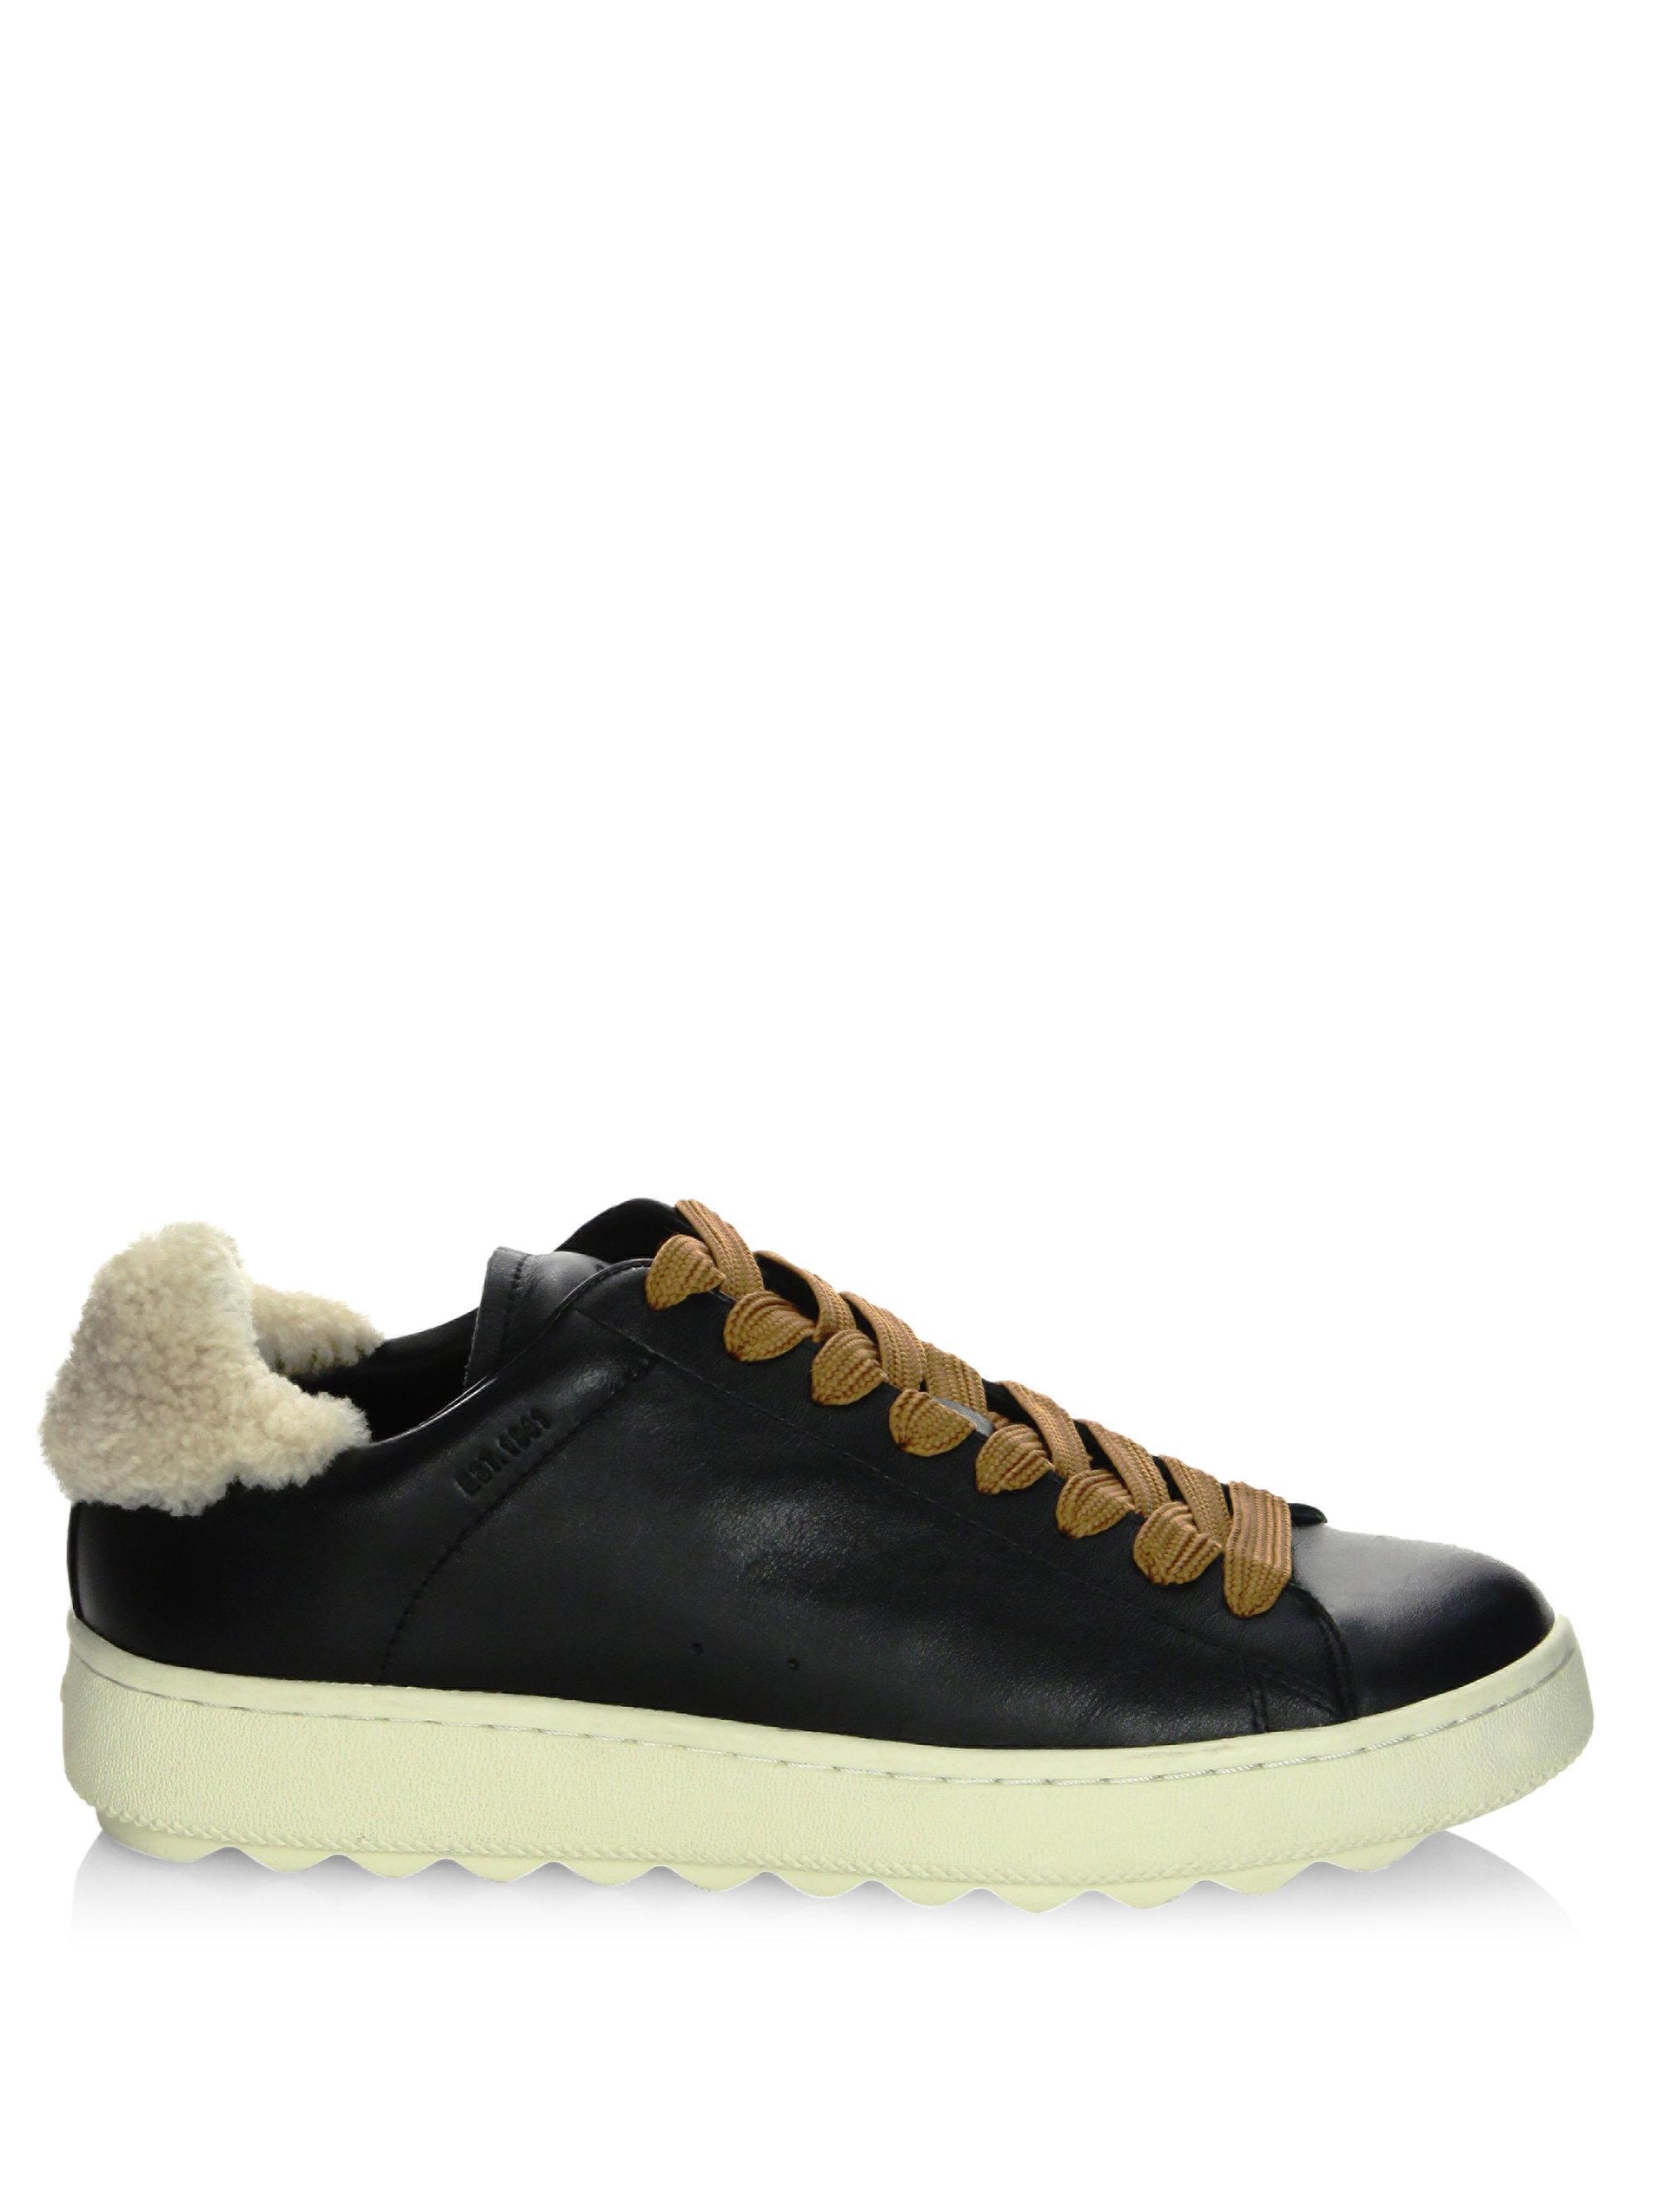 CoachShearling Tab Sneakers Likk1azyc3